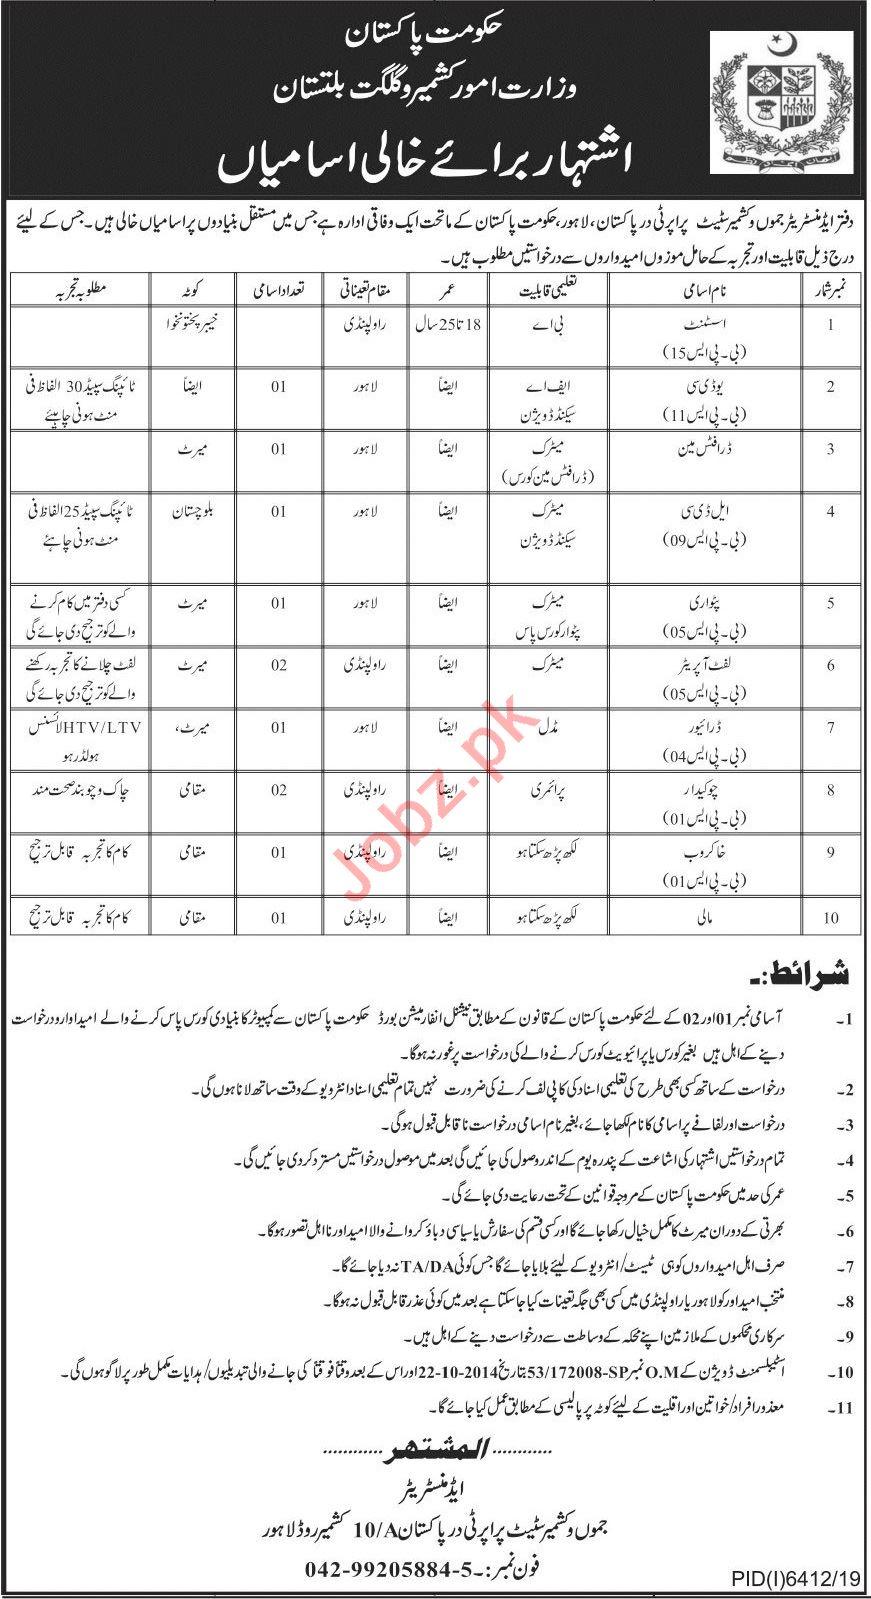 Ministry of Kashmir Affairs & Gilgit Baltistan Clerical Jobs